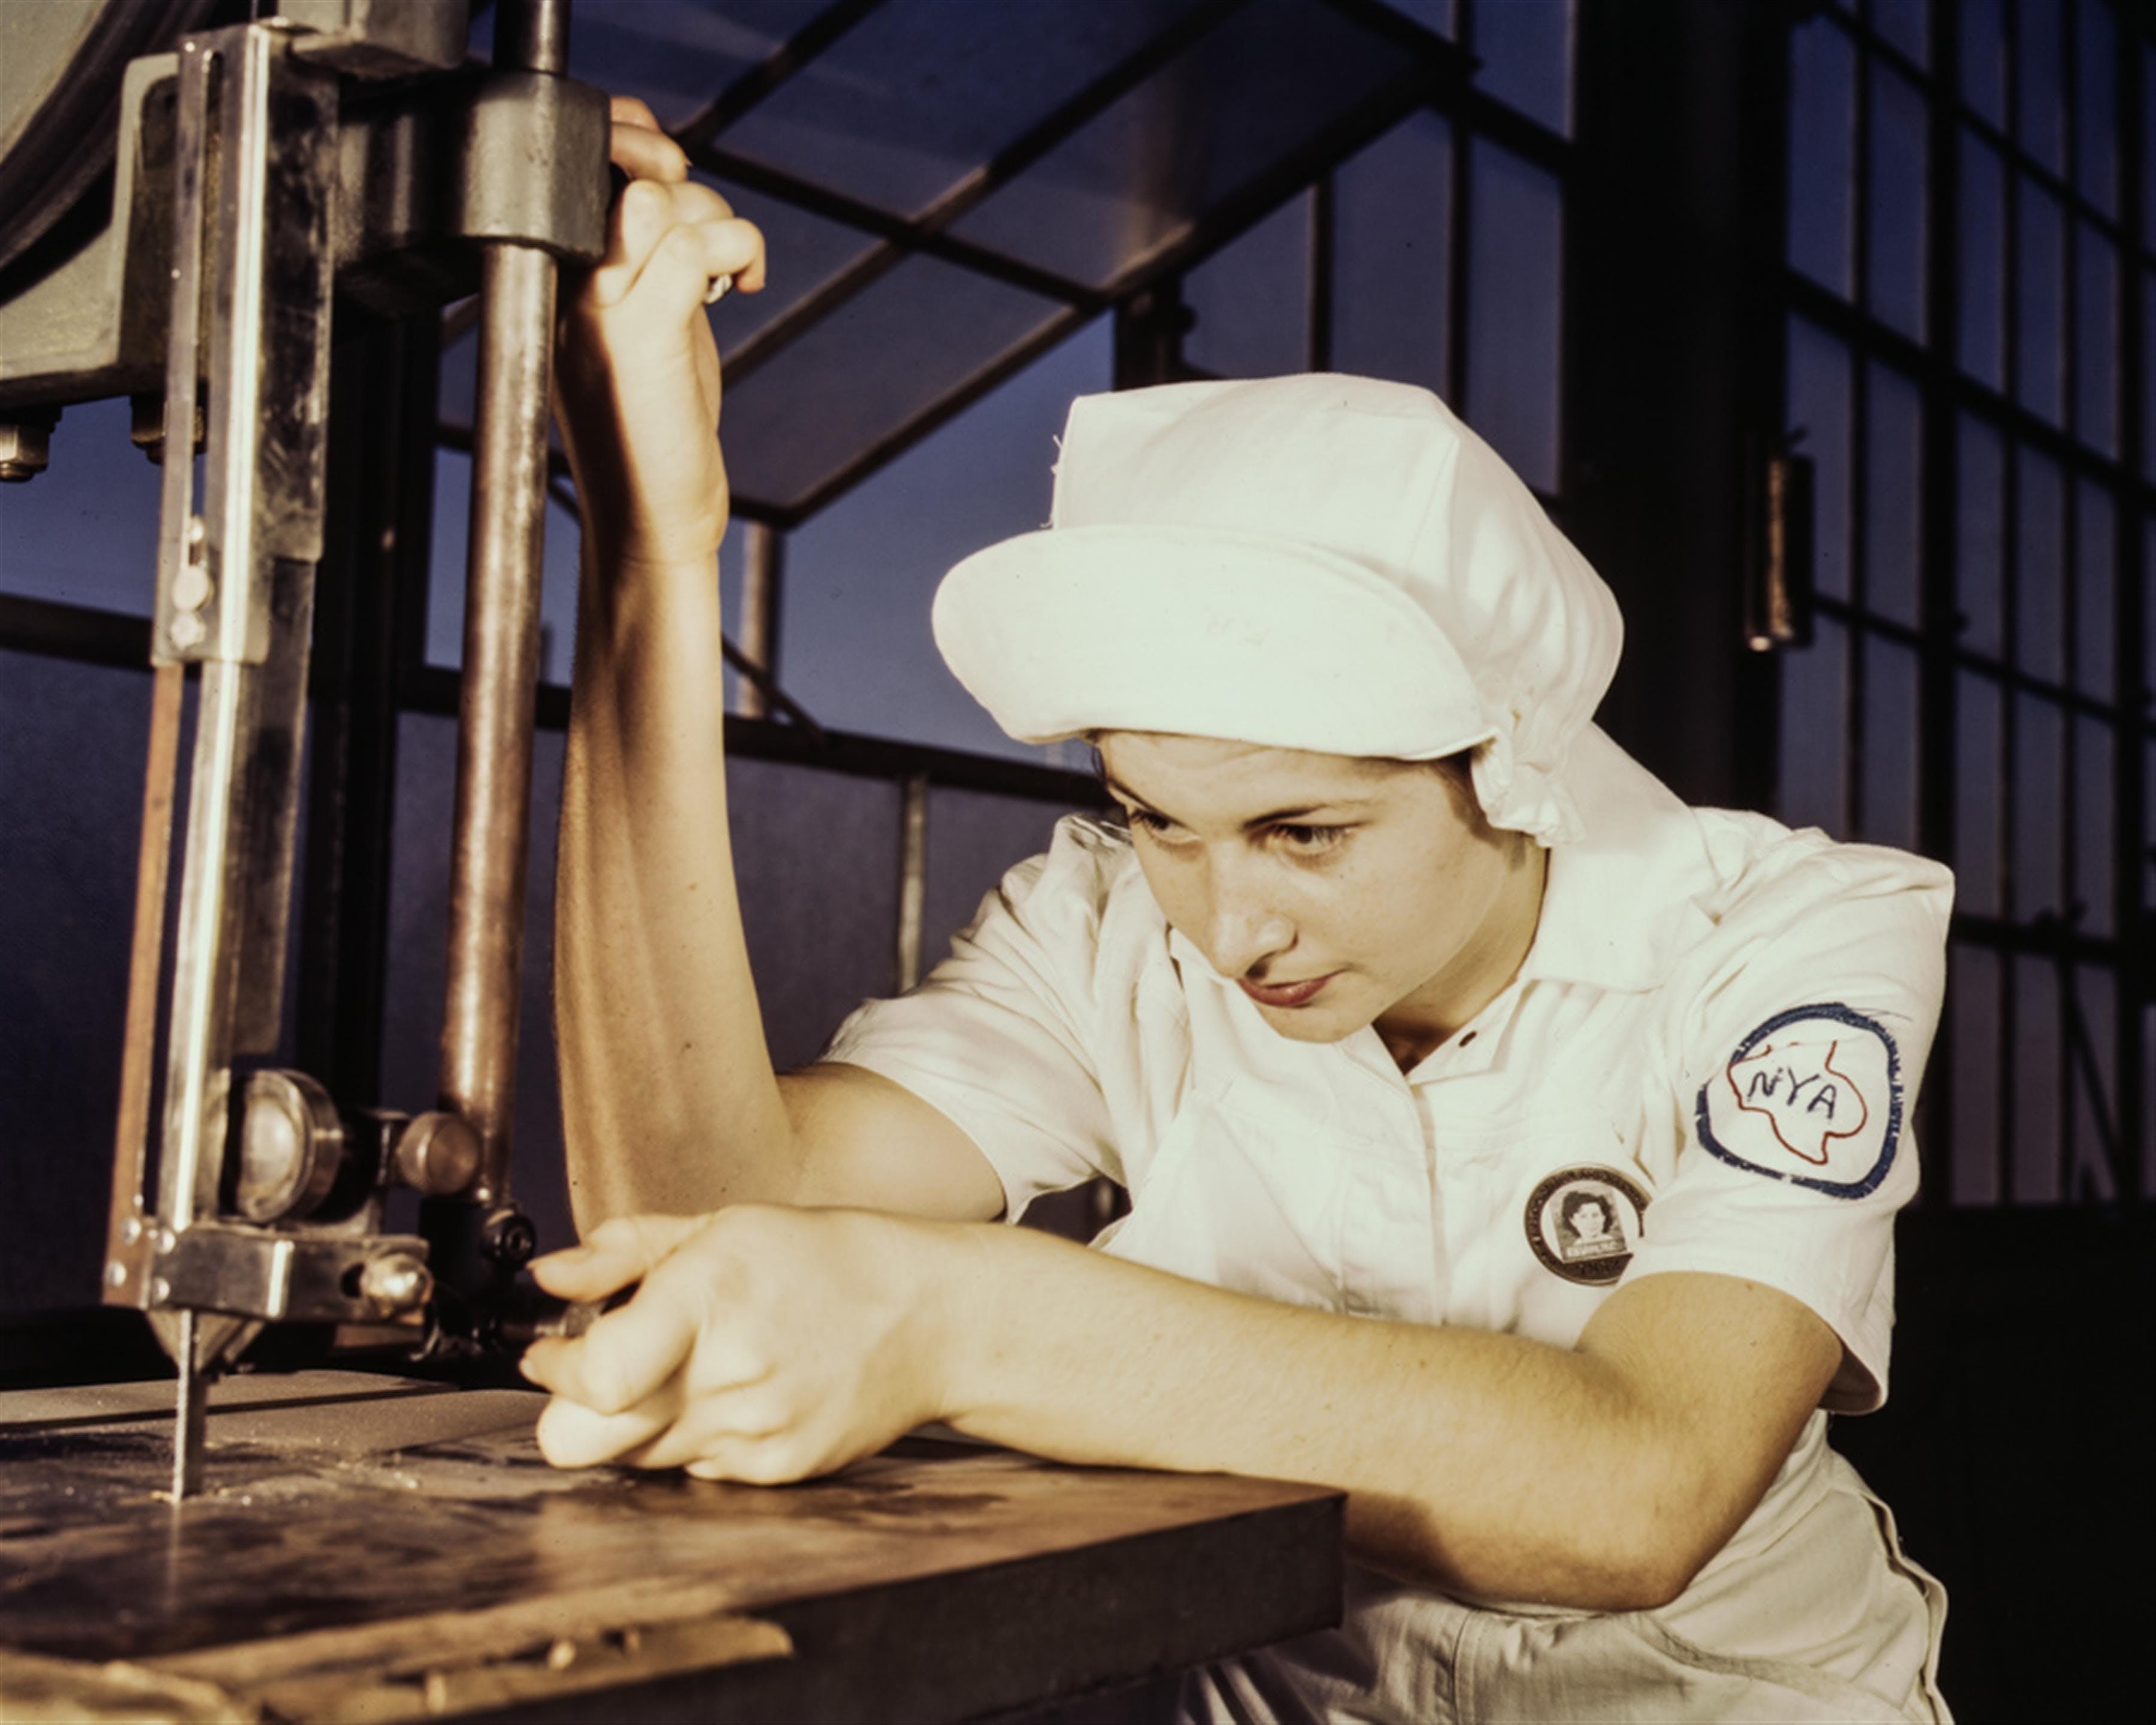 Kostenloses Stock Foto zu arbeiter, beruf, erwachsener, fabrik